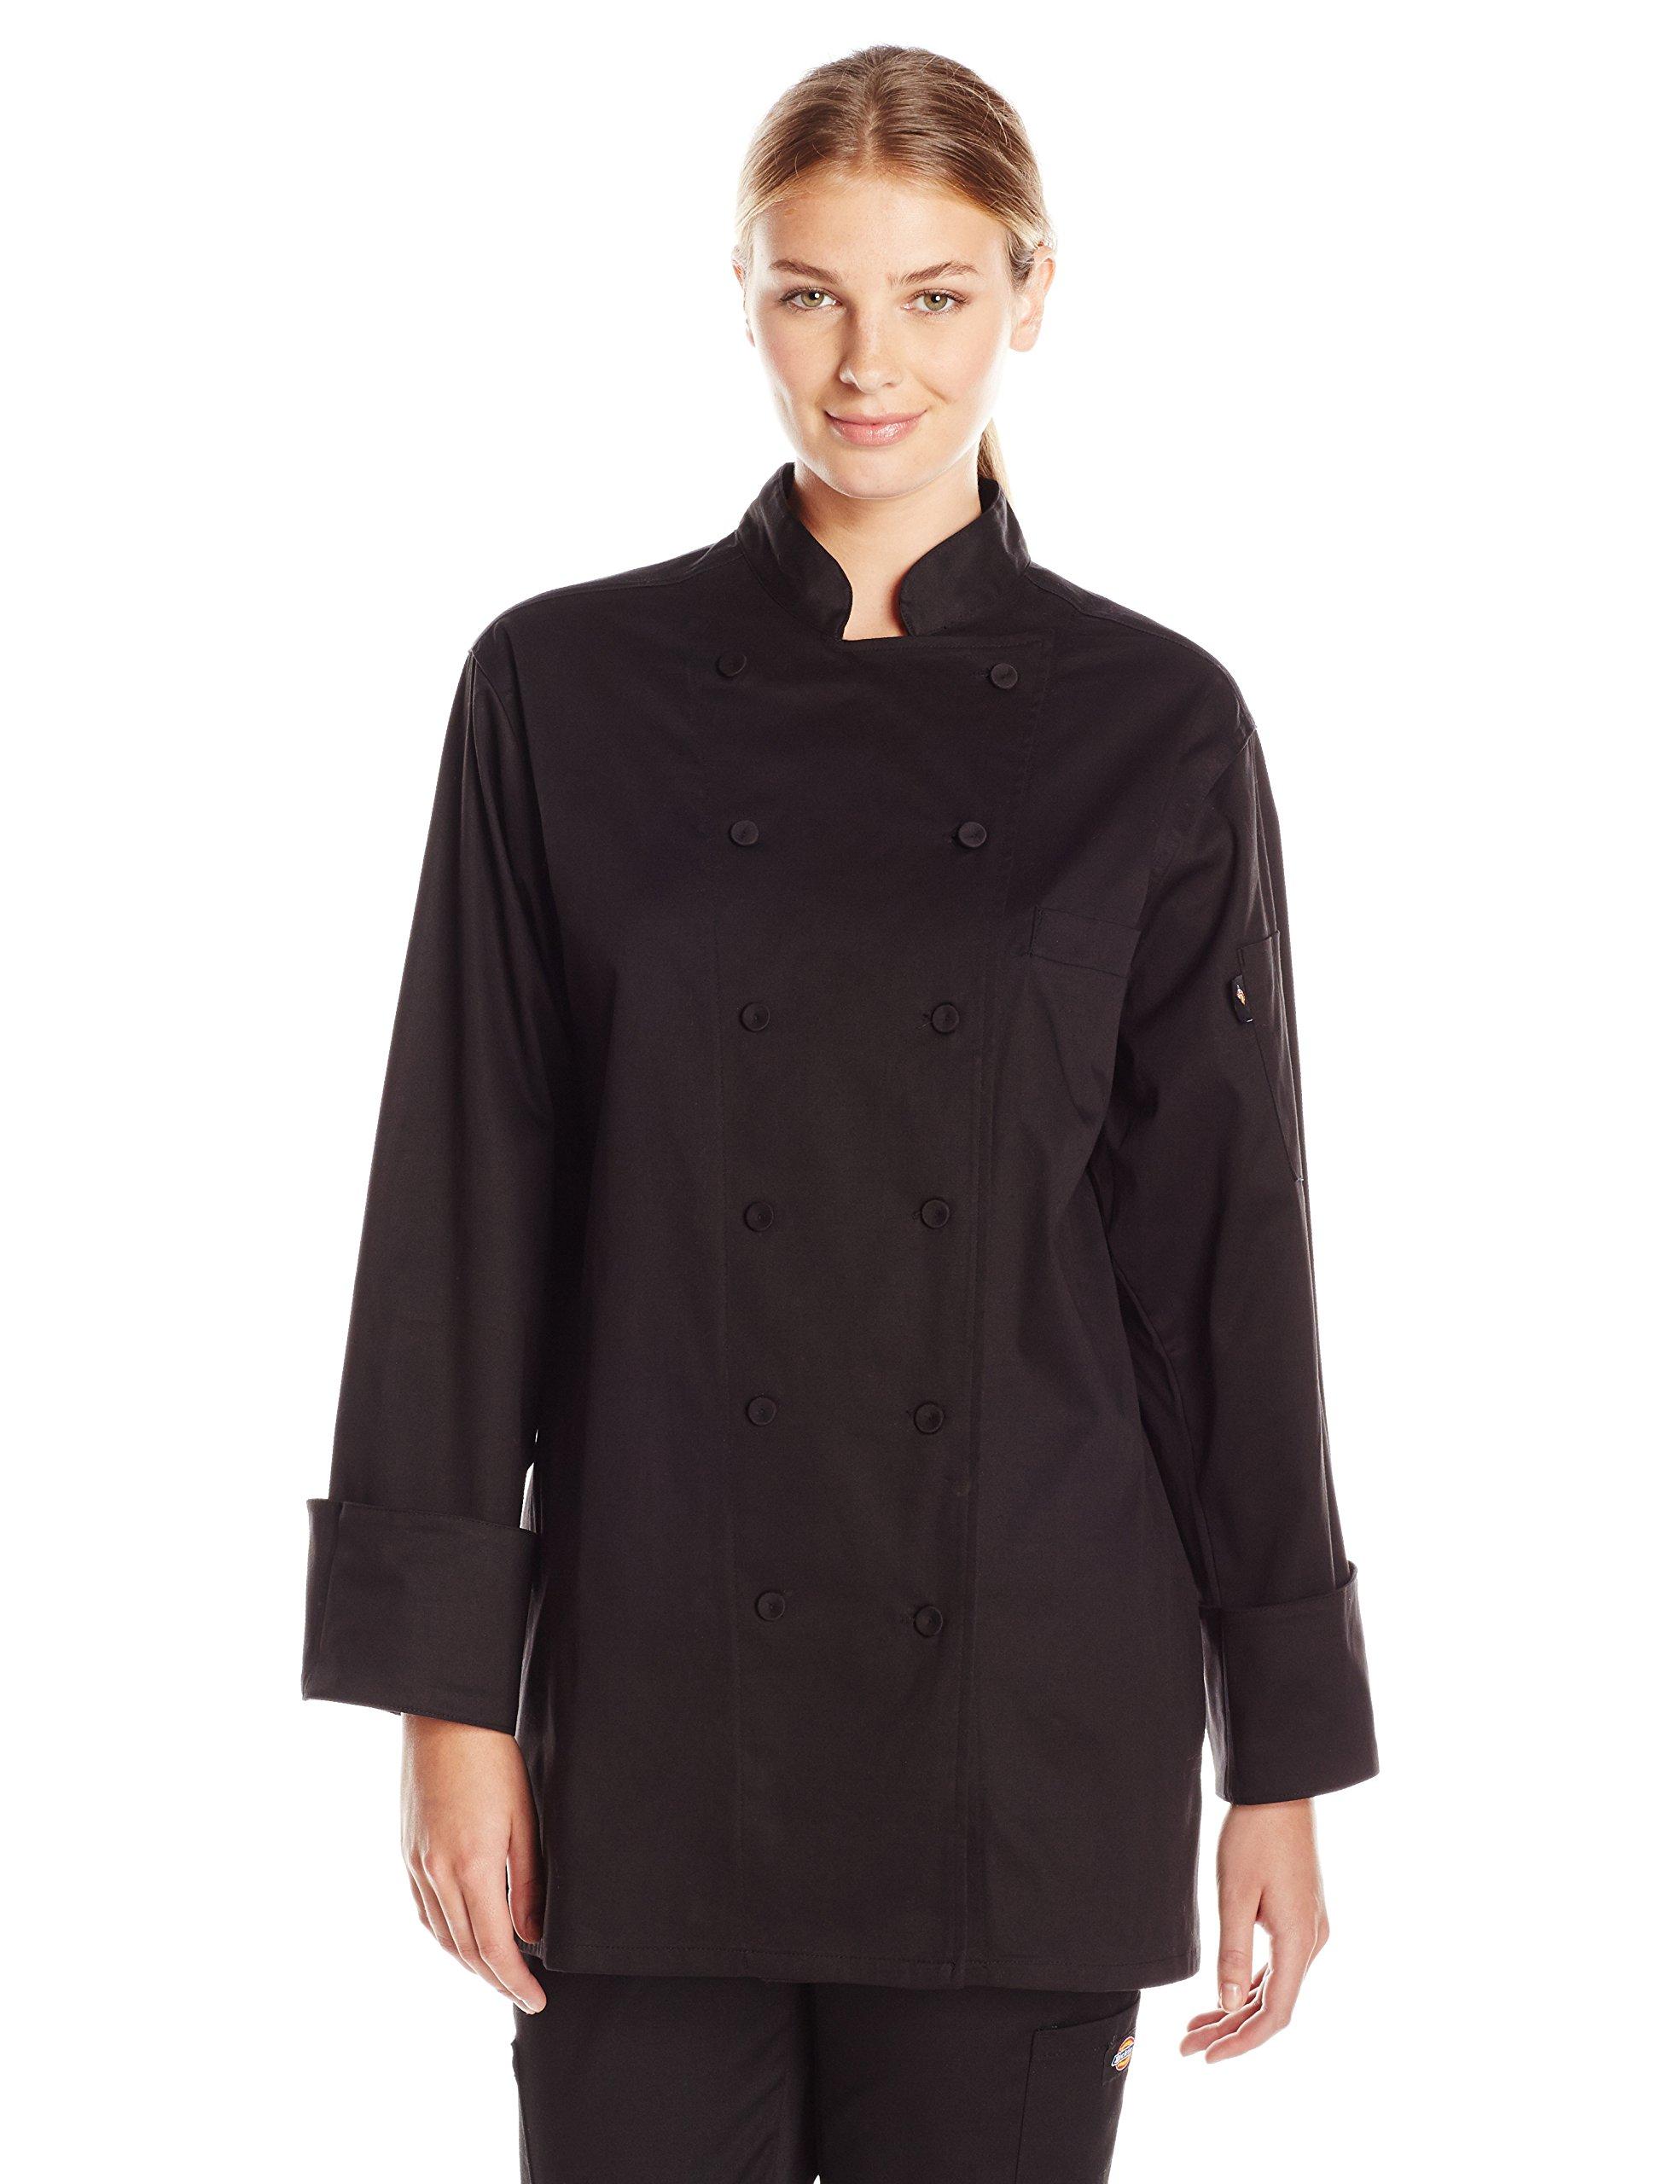 Dickies Chef Women's Executive Coat, Black, X-Large